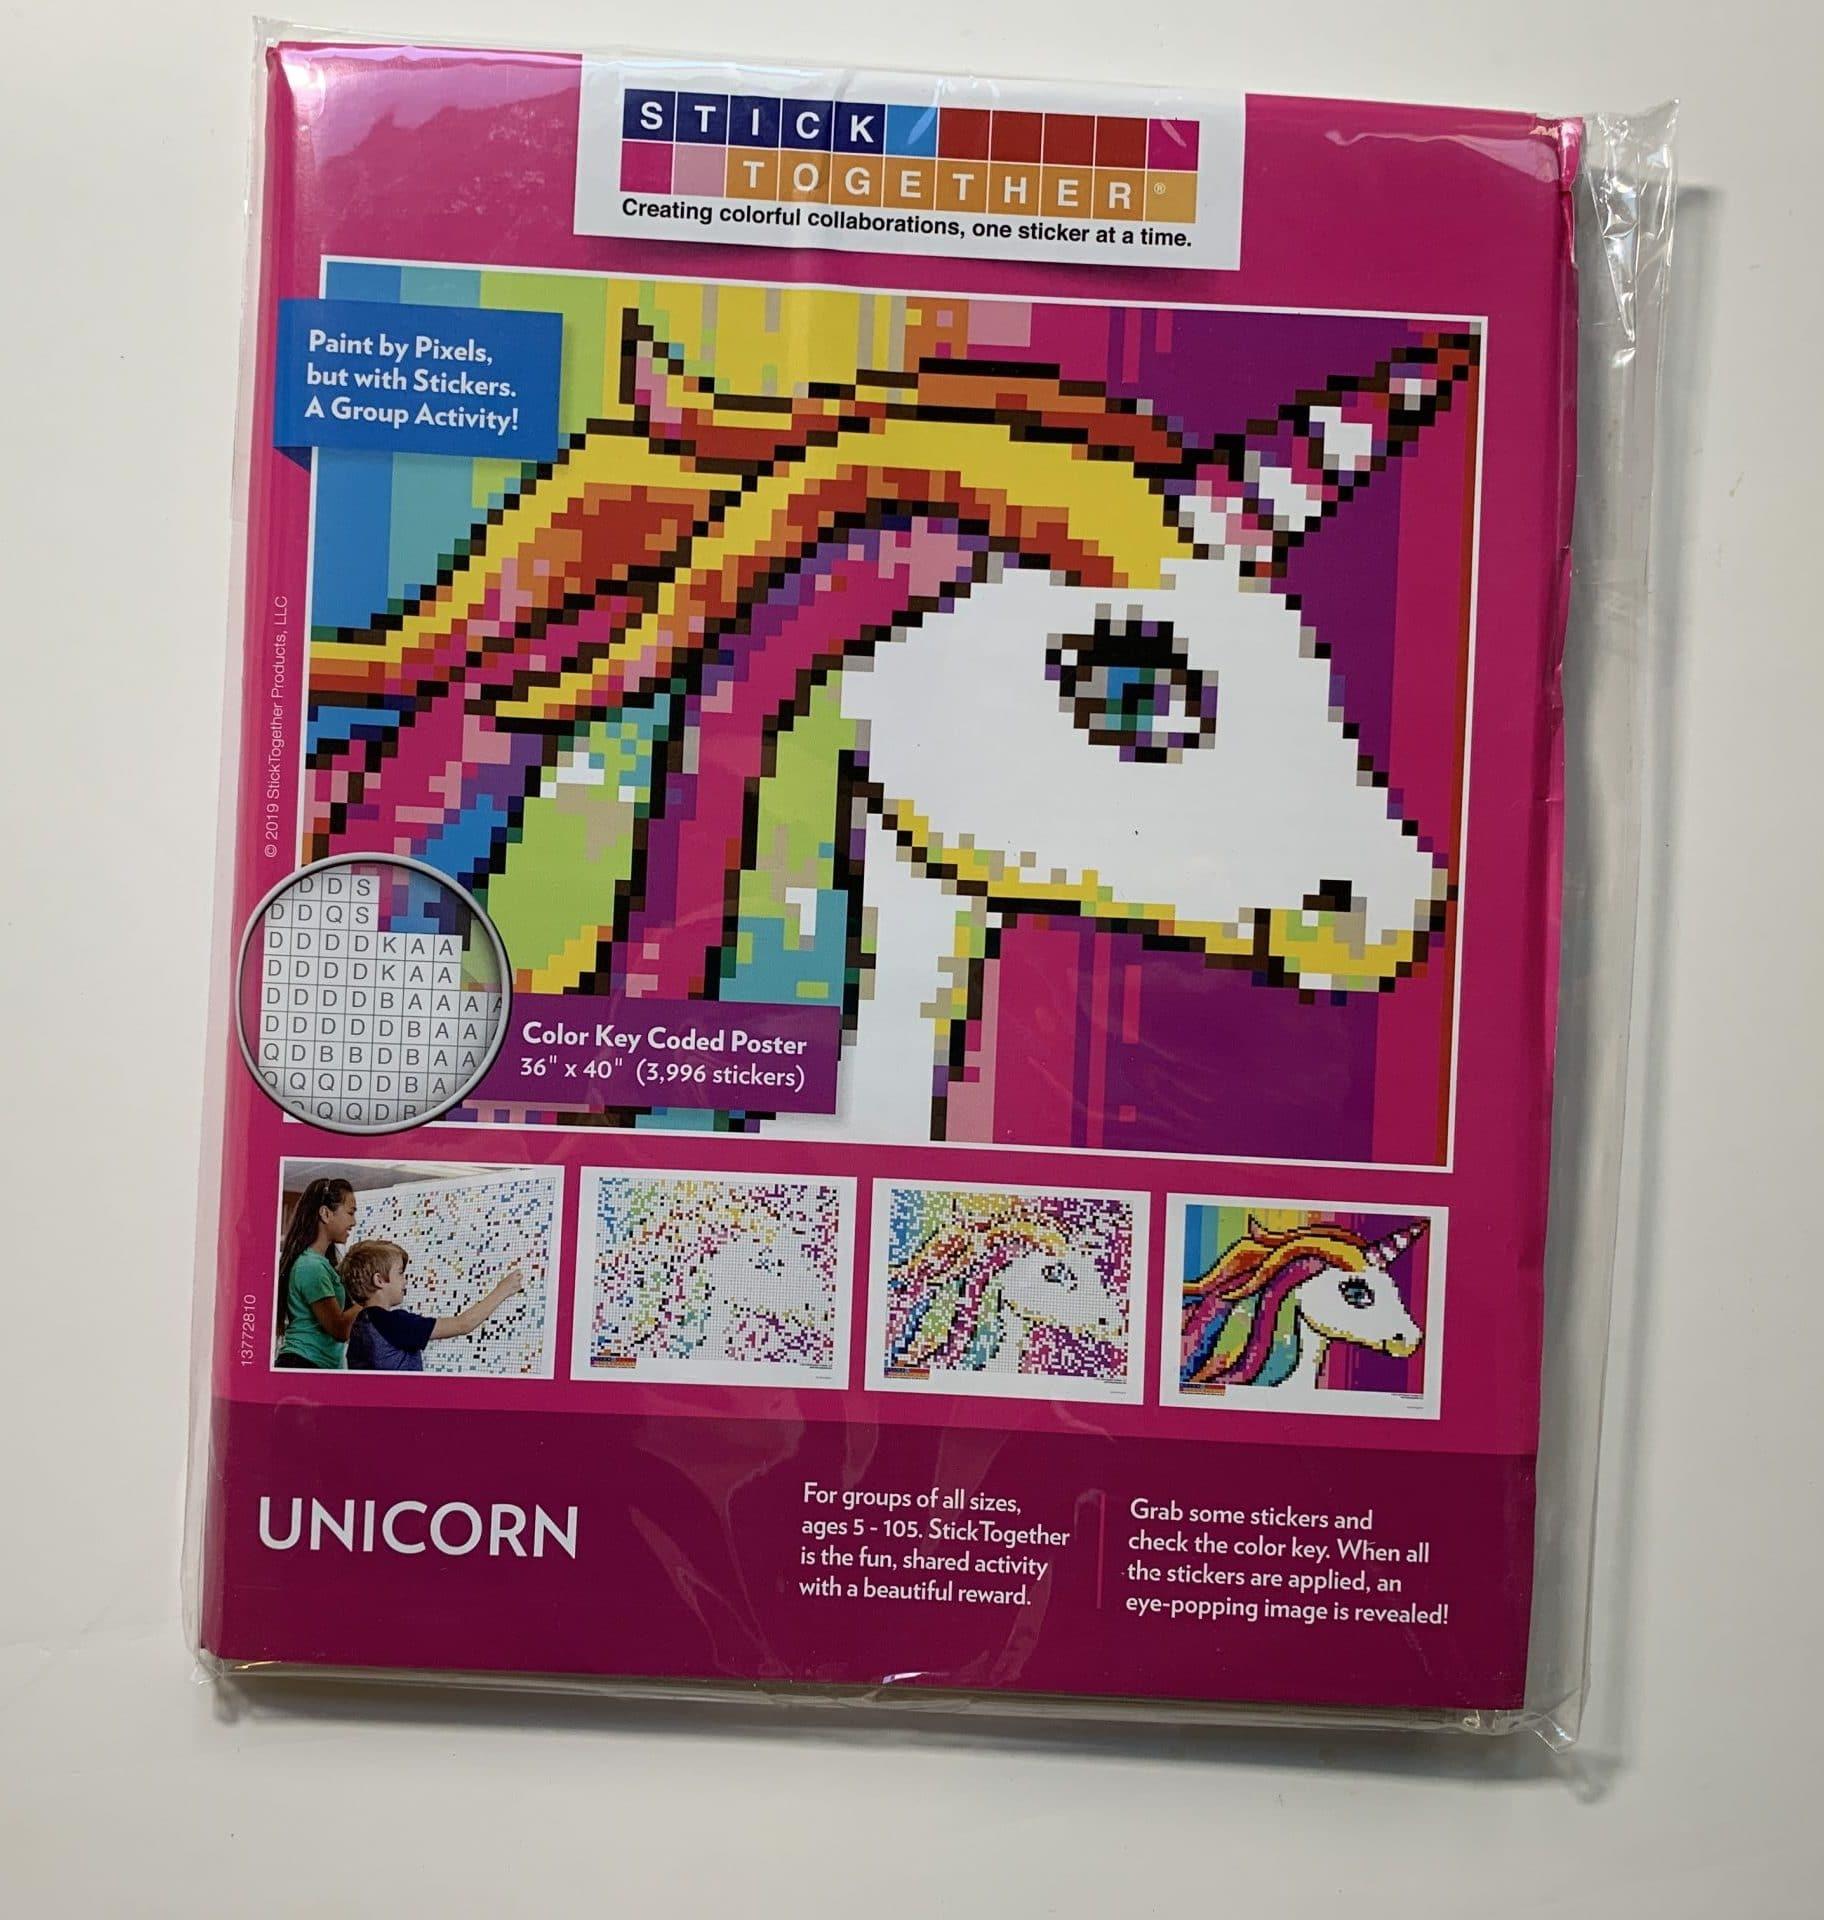 Stick Together unicorn mosaic